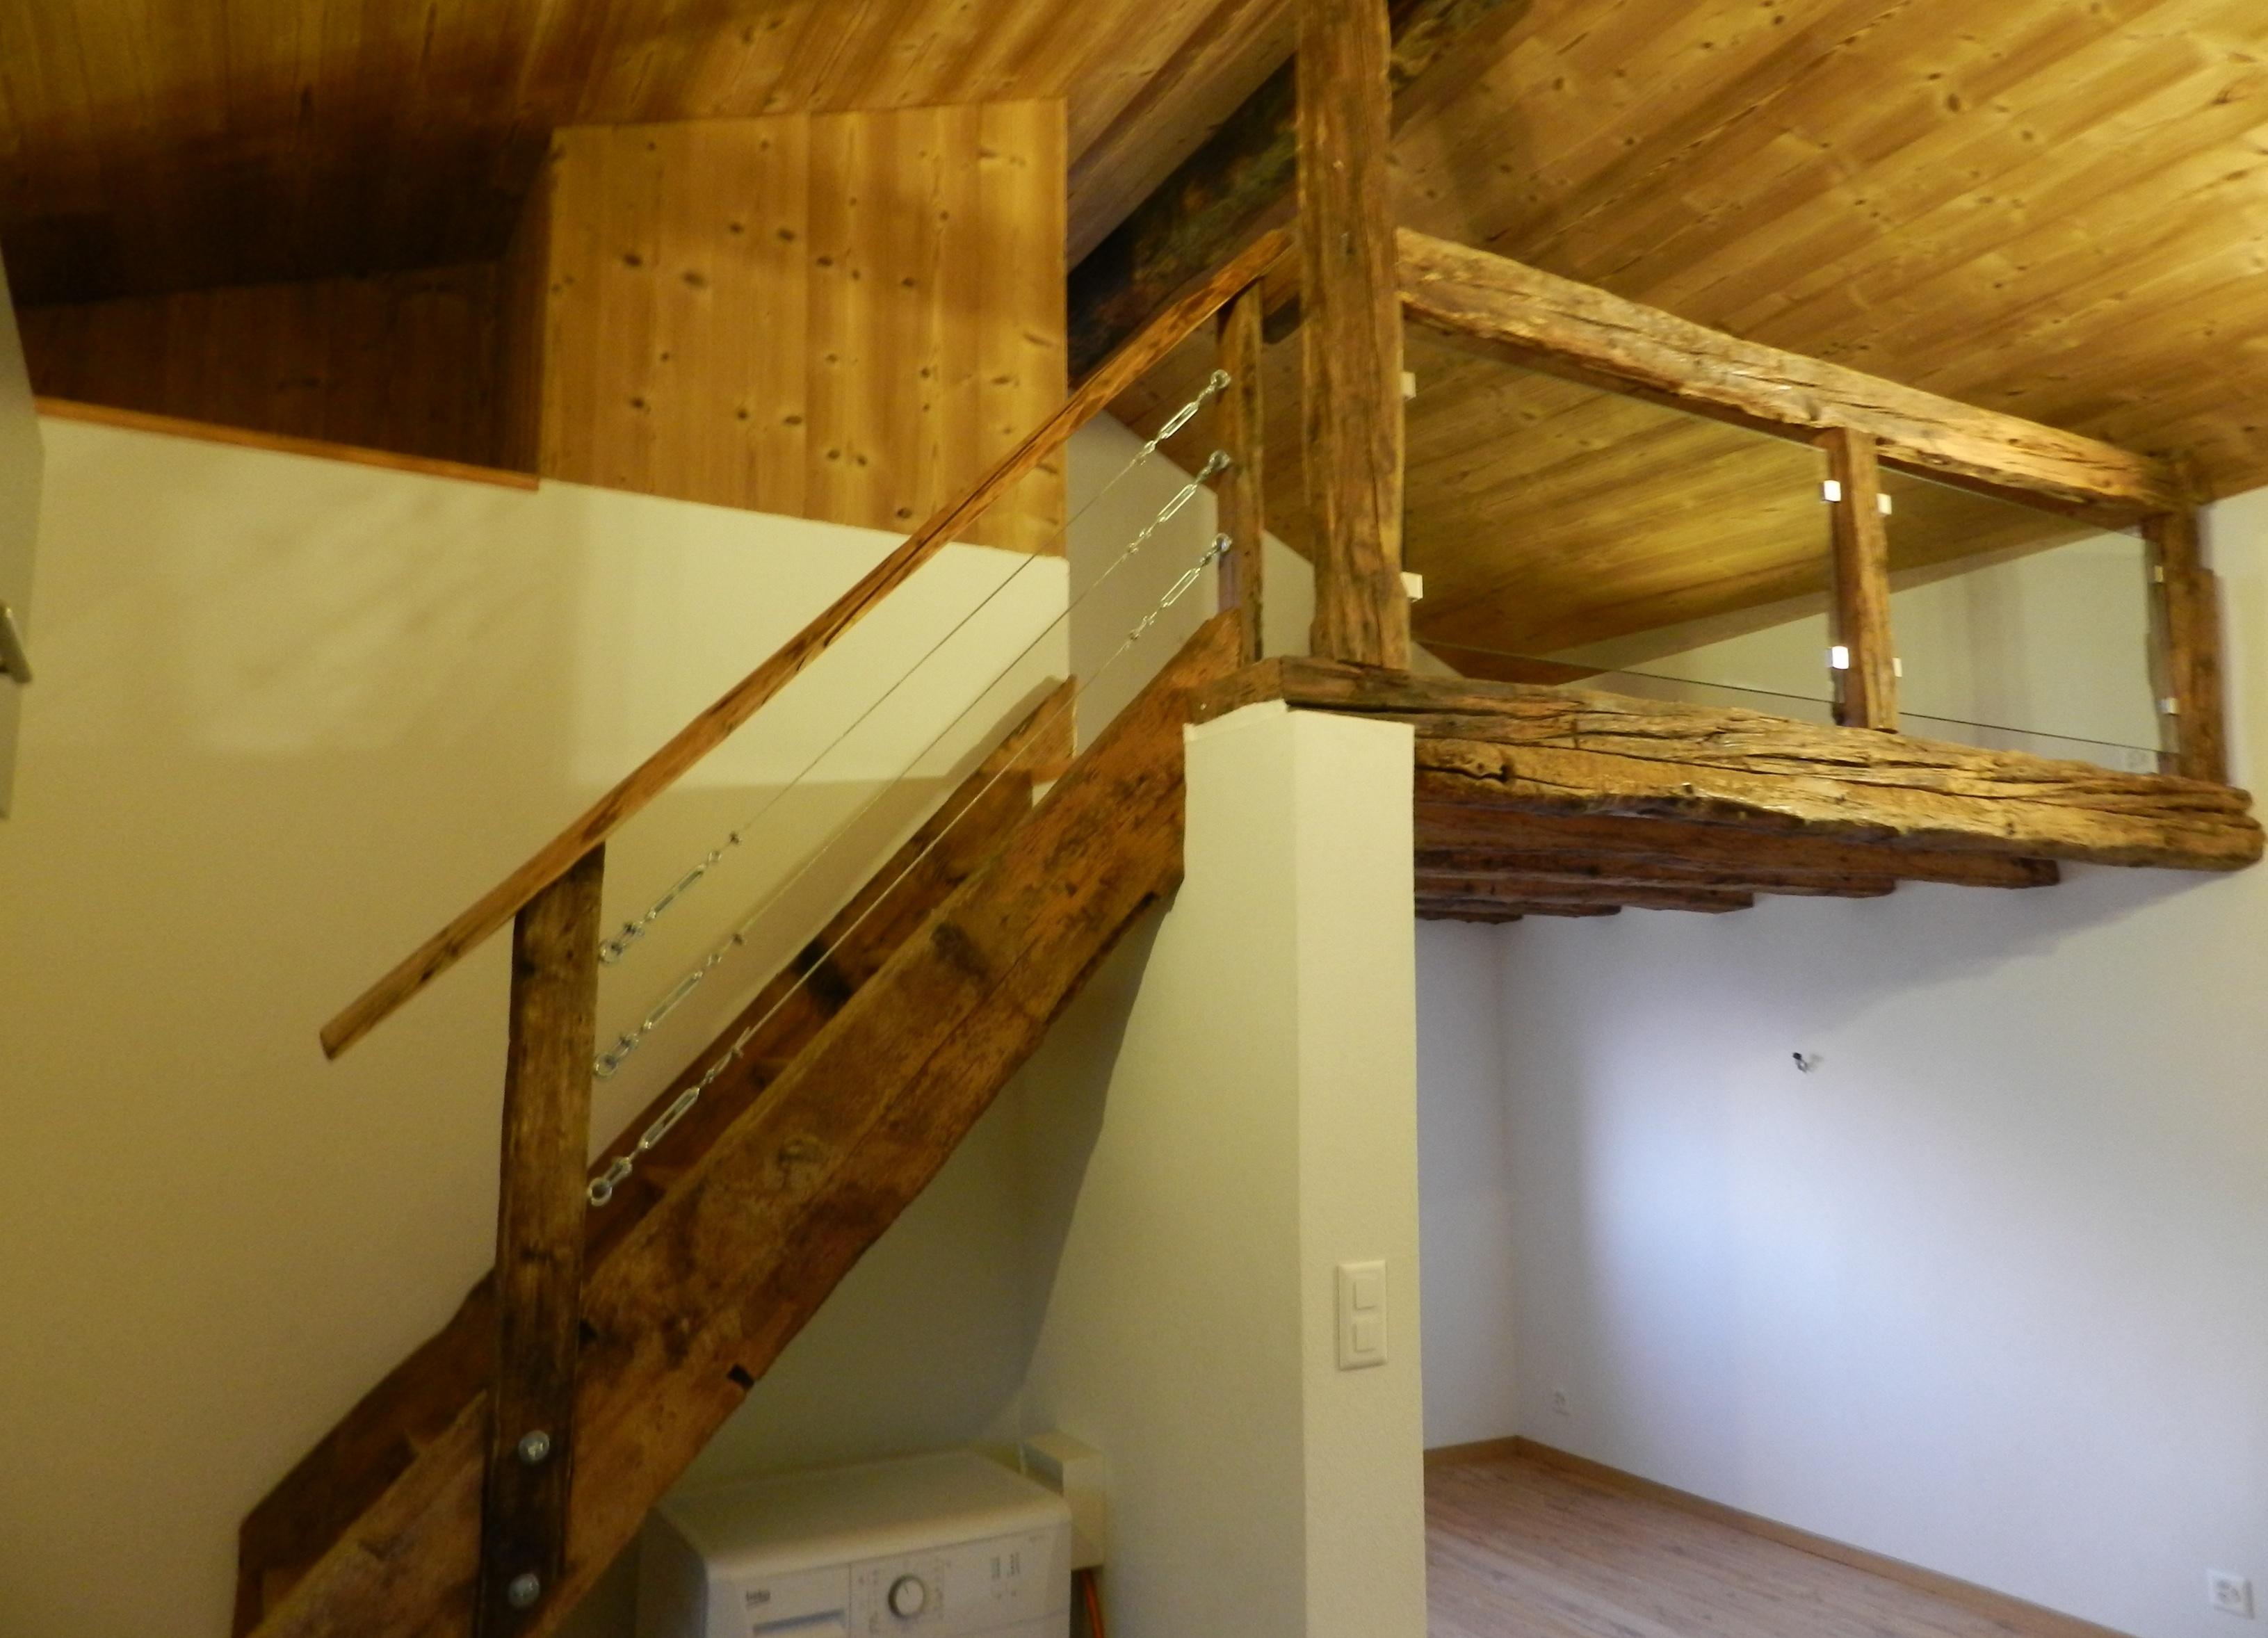 transformation d une grange rurale en habitation corin. Black Bedroom Furniture Sets. Home Design Ideas